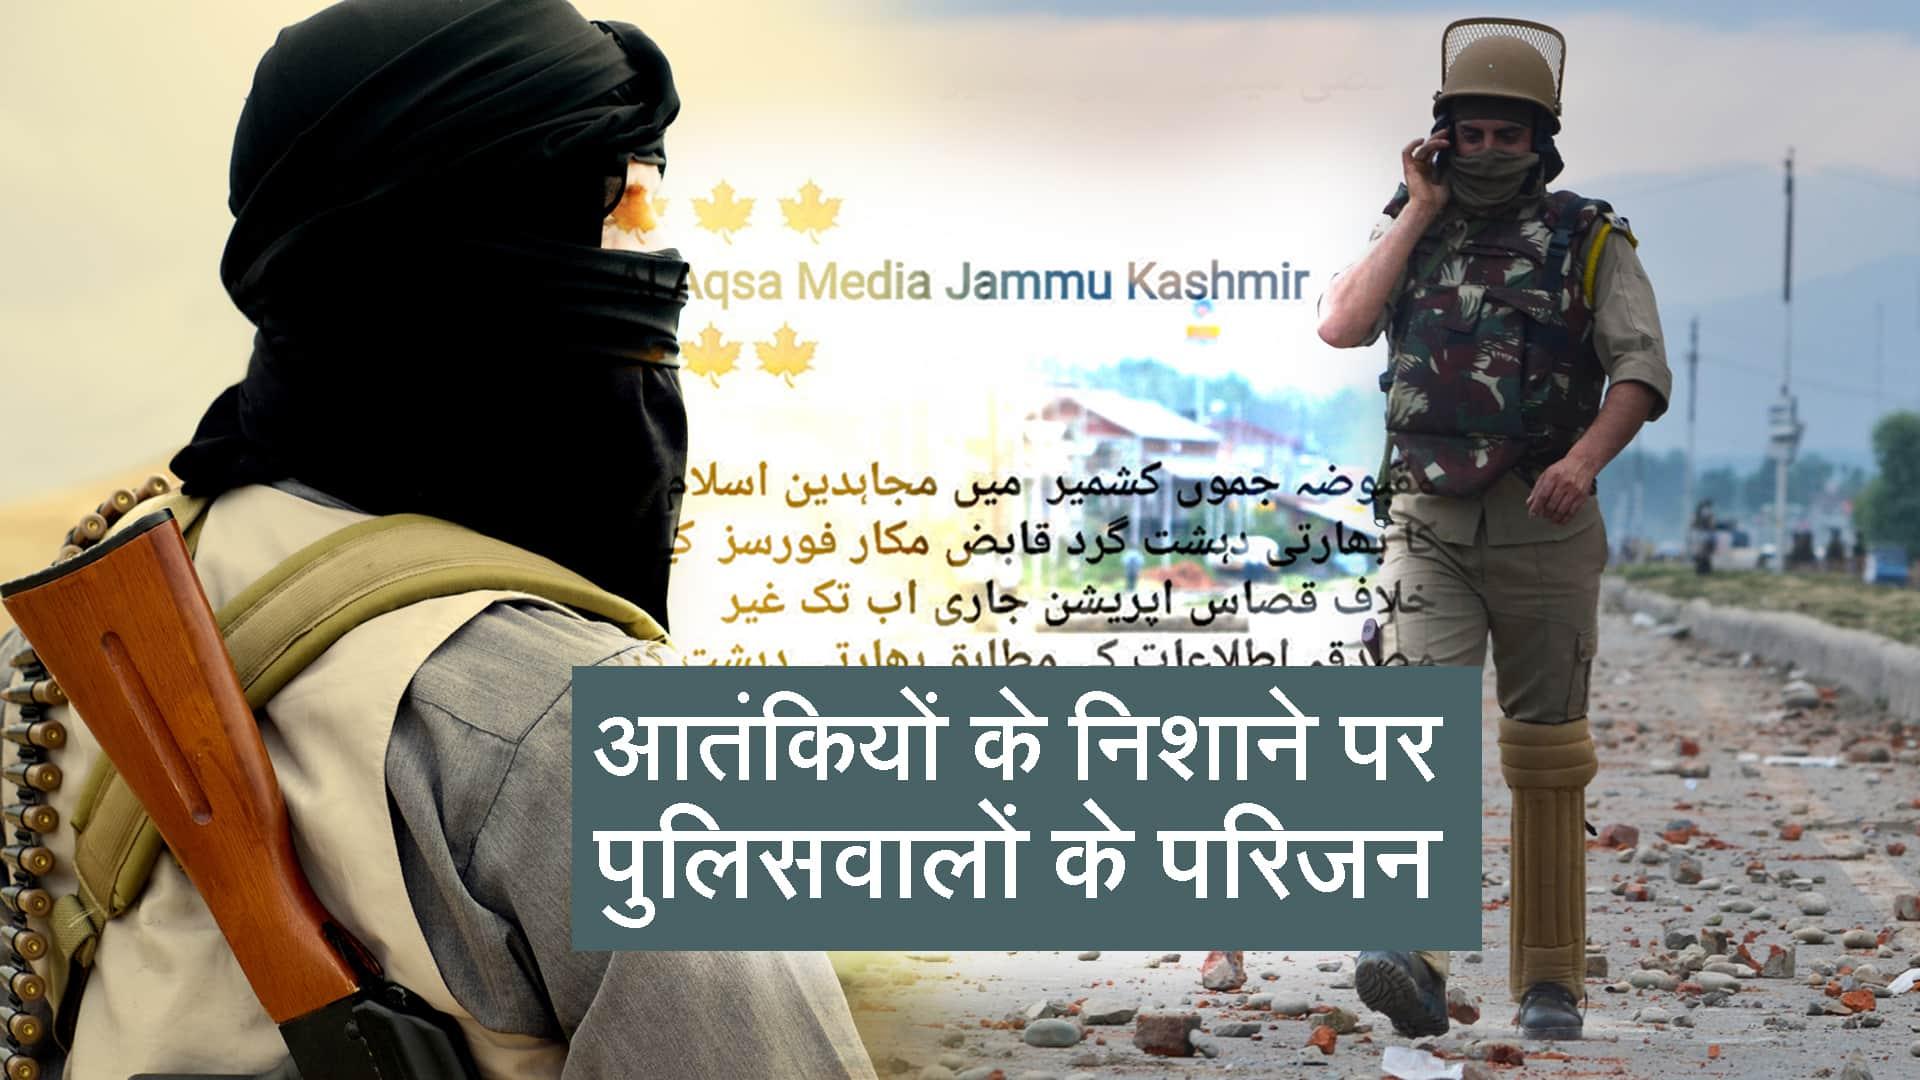 Terrorists abducted 7 members of policemen in Kashmir-valley